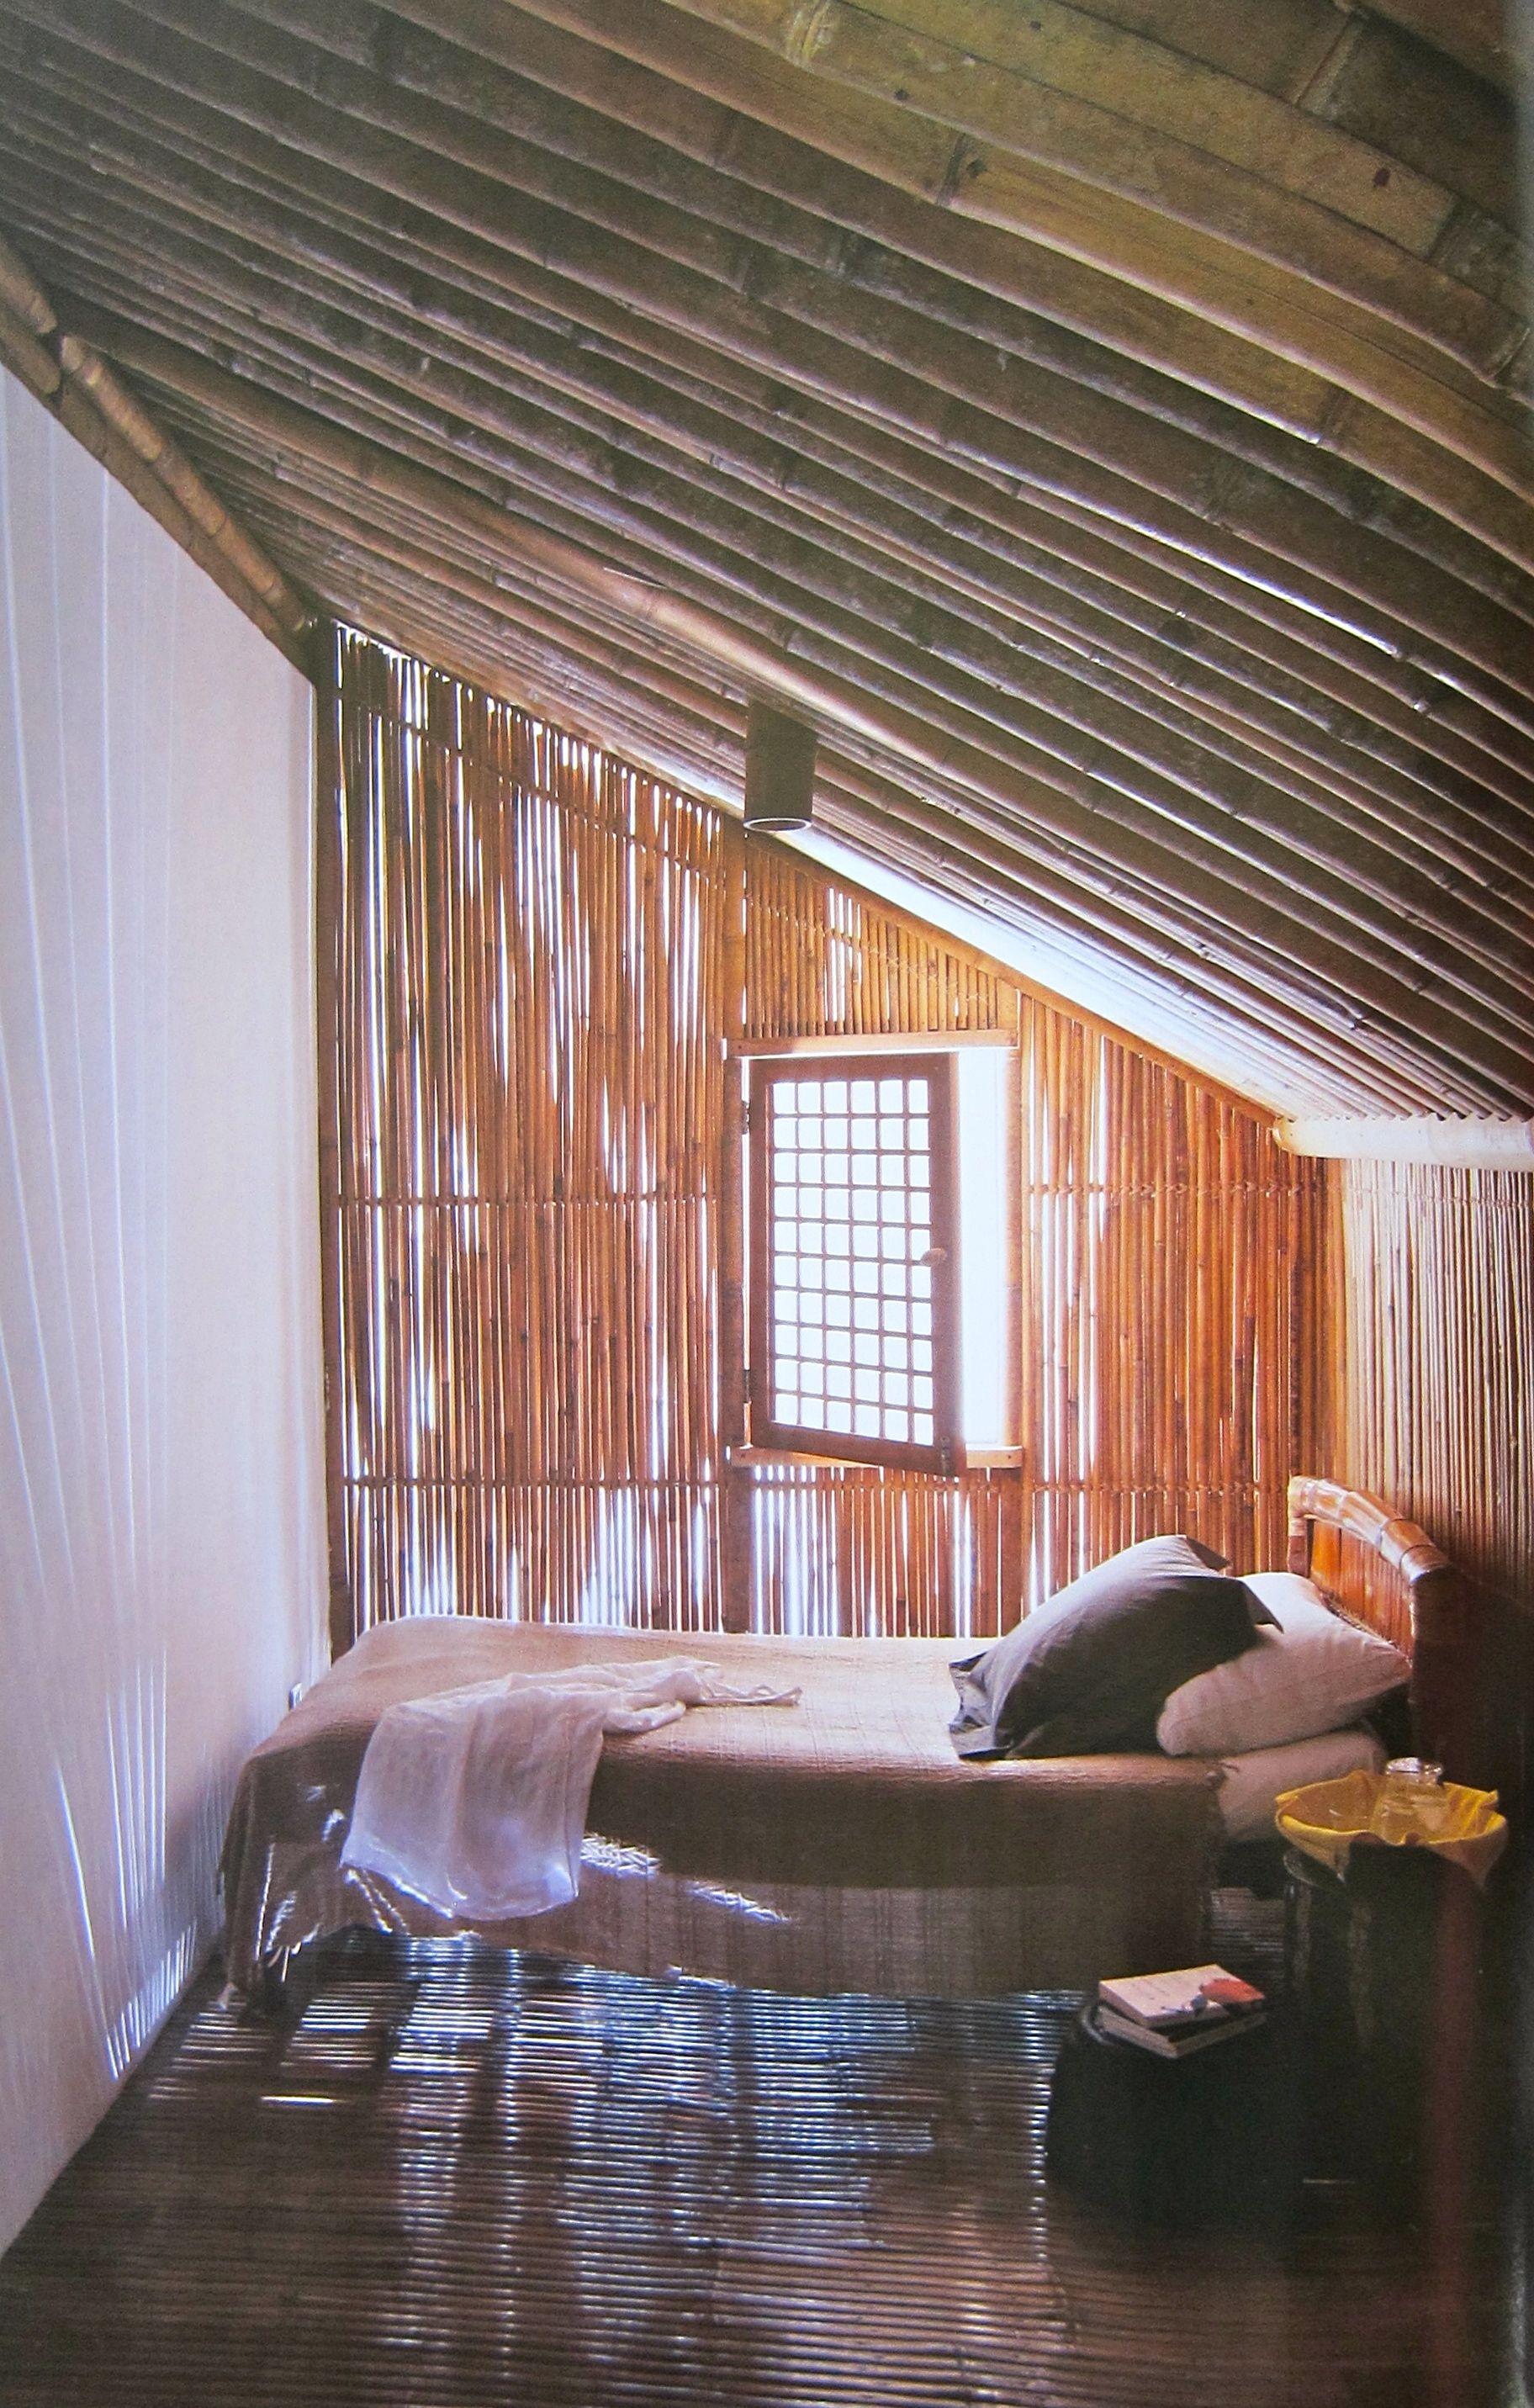 Bamboo bedroom Dream House Ideas Philippine houses